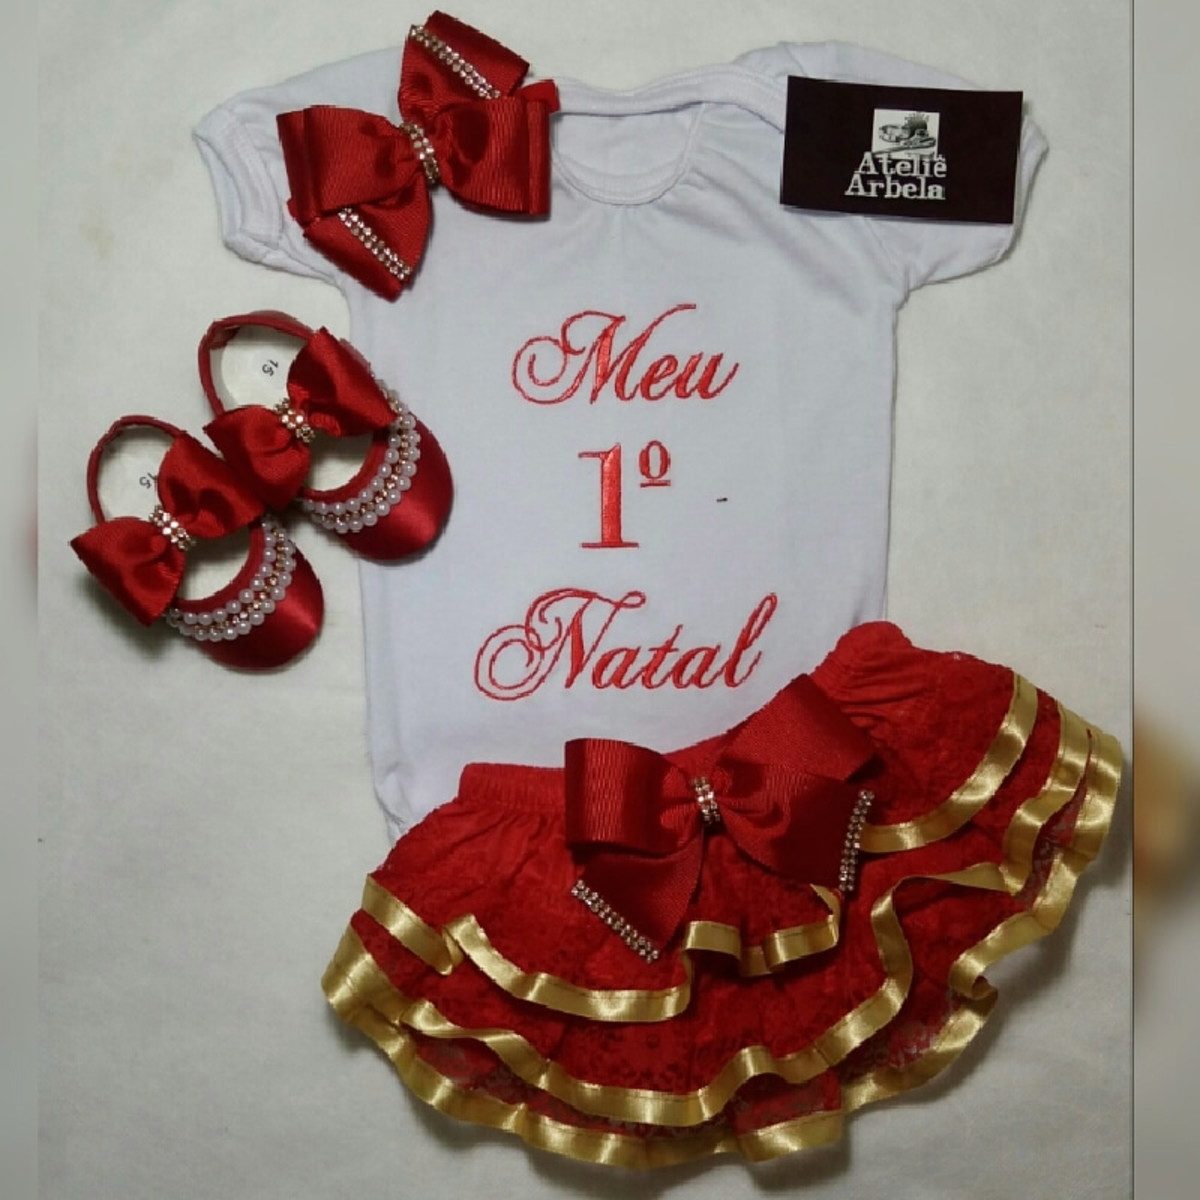 94bf08997 Kits natal e ano novo reveillon personalizado no Elo7